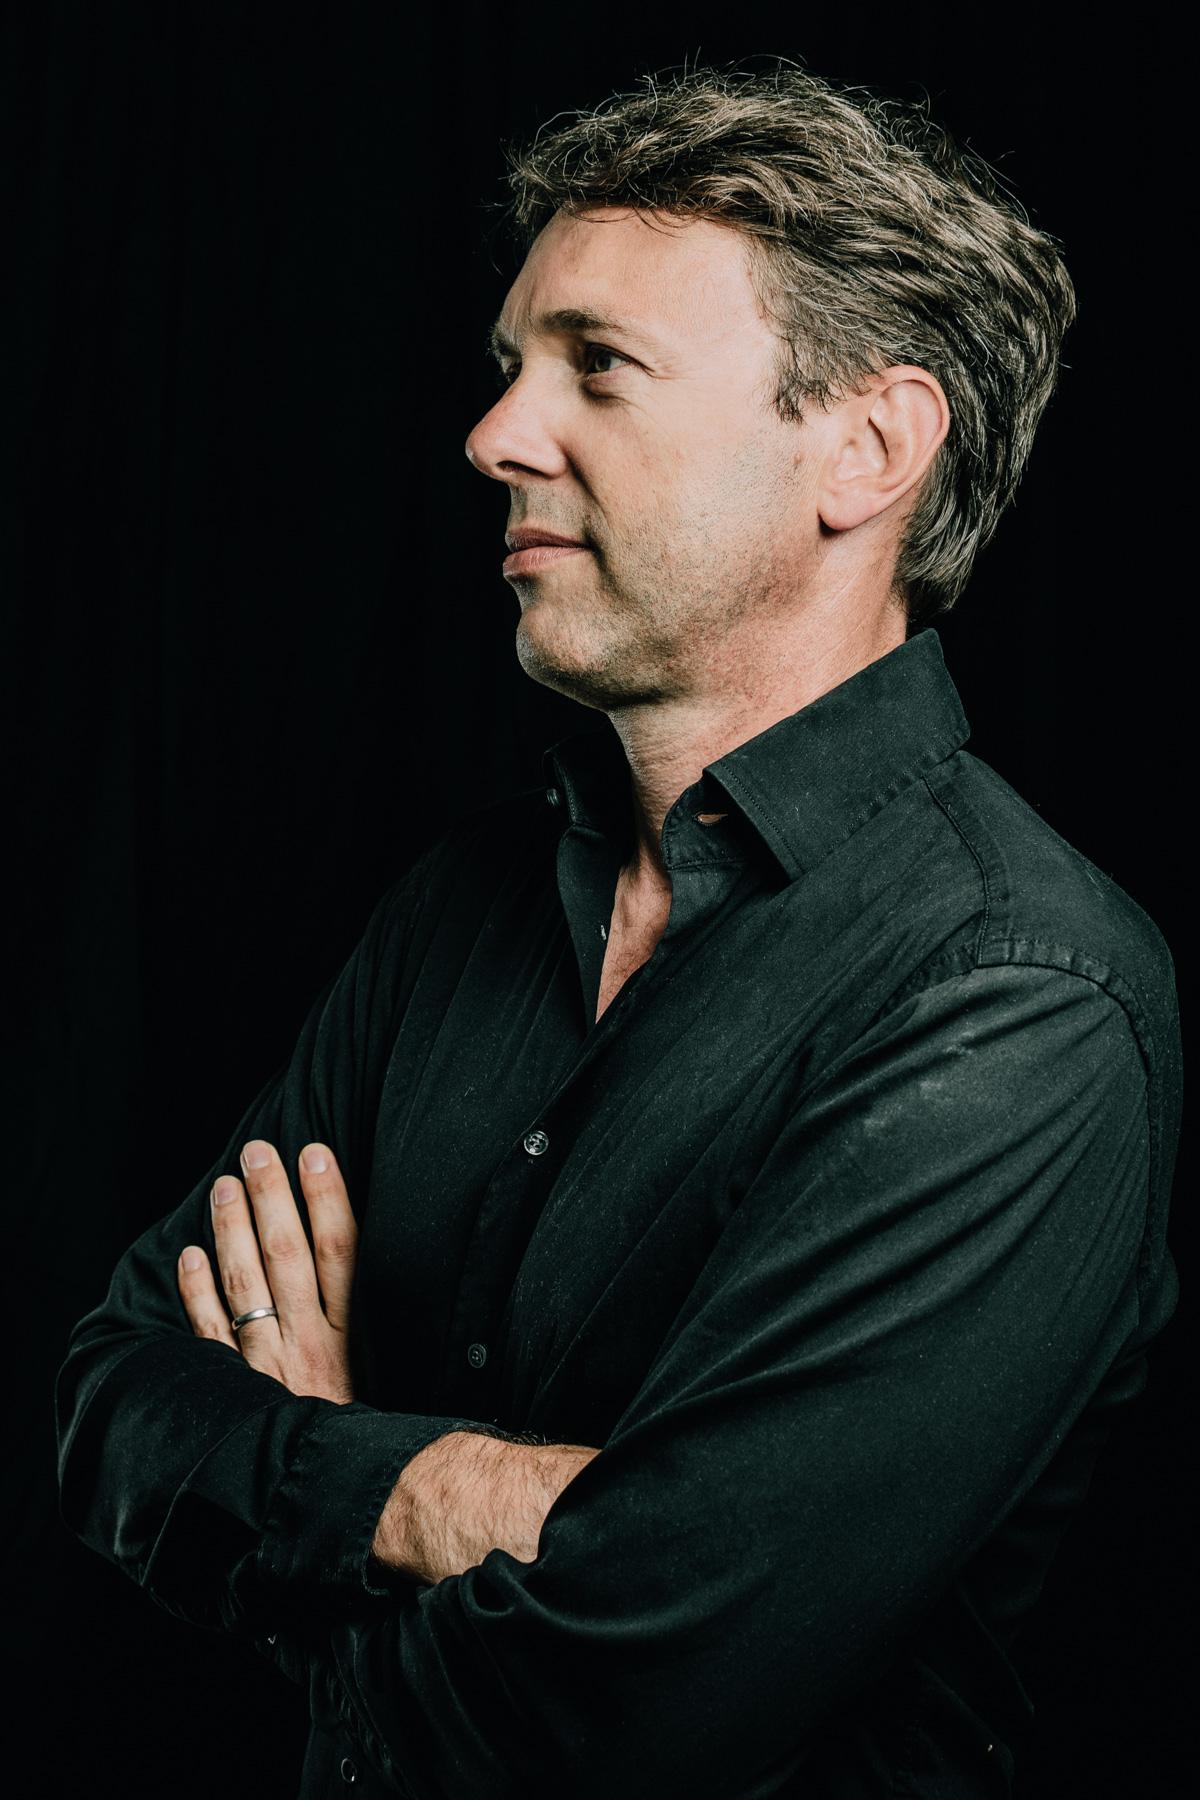 Jean-Christophe Brisard